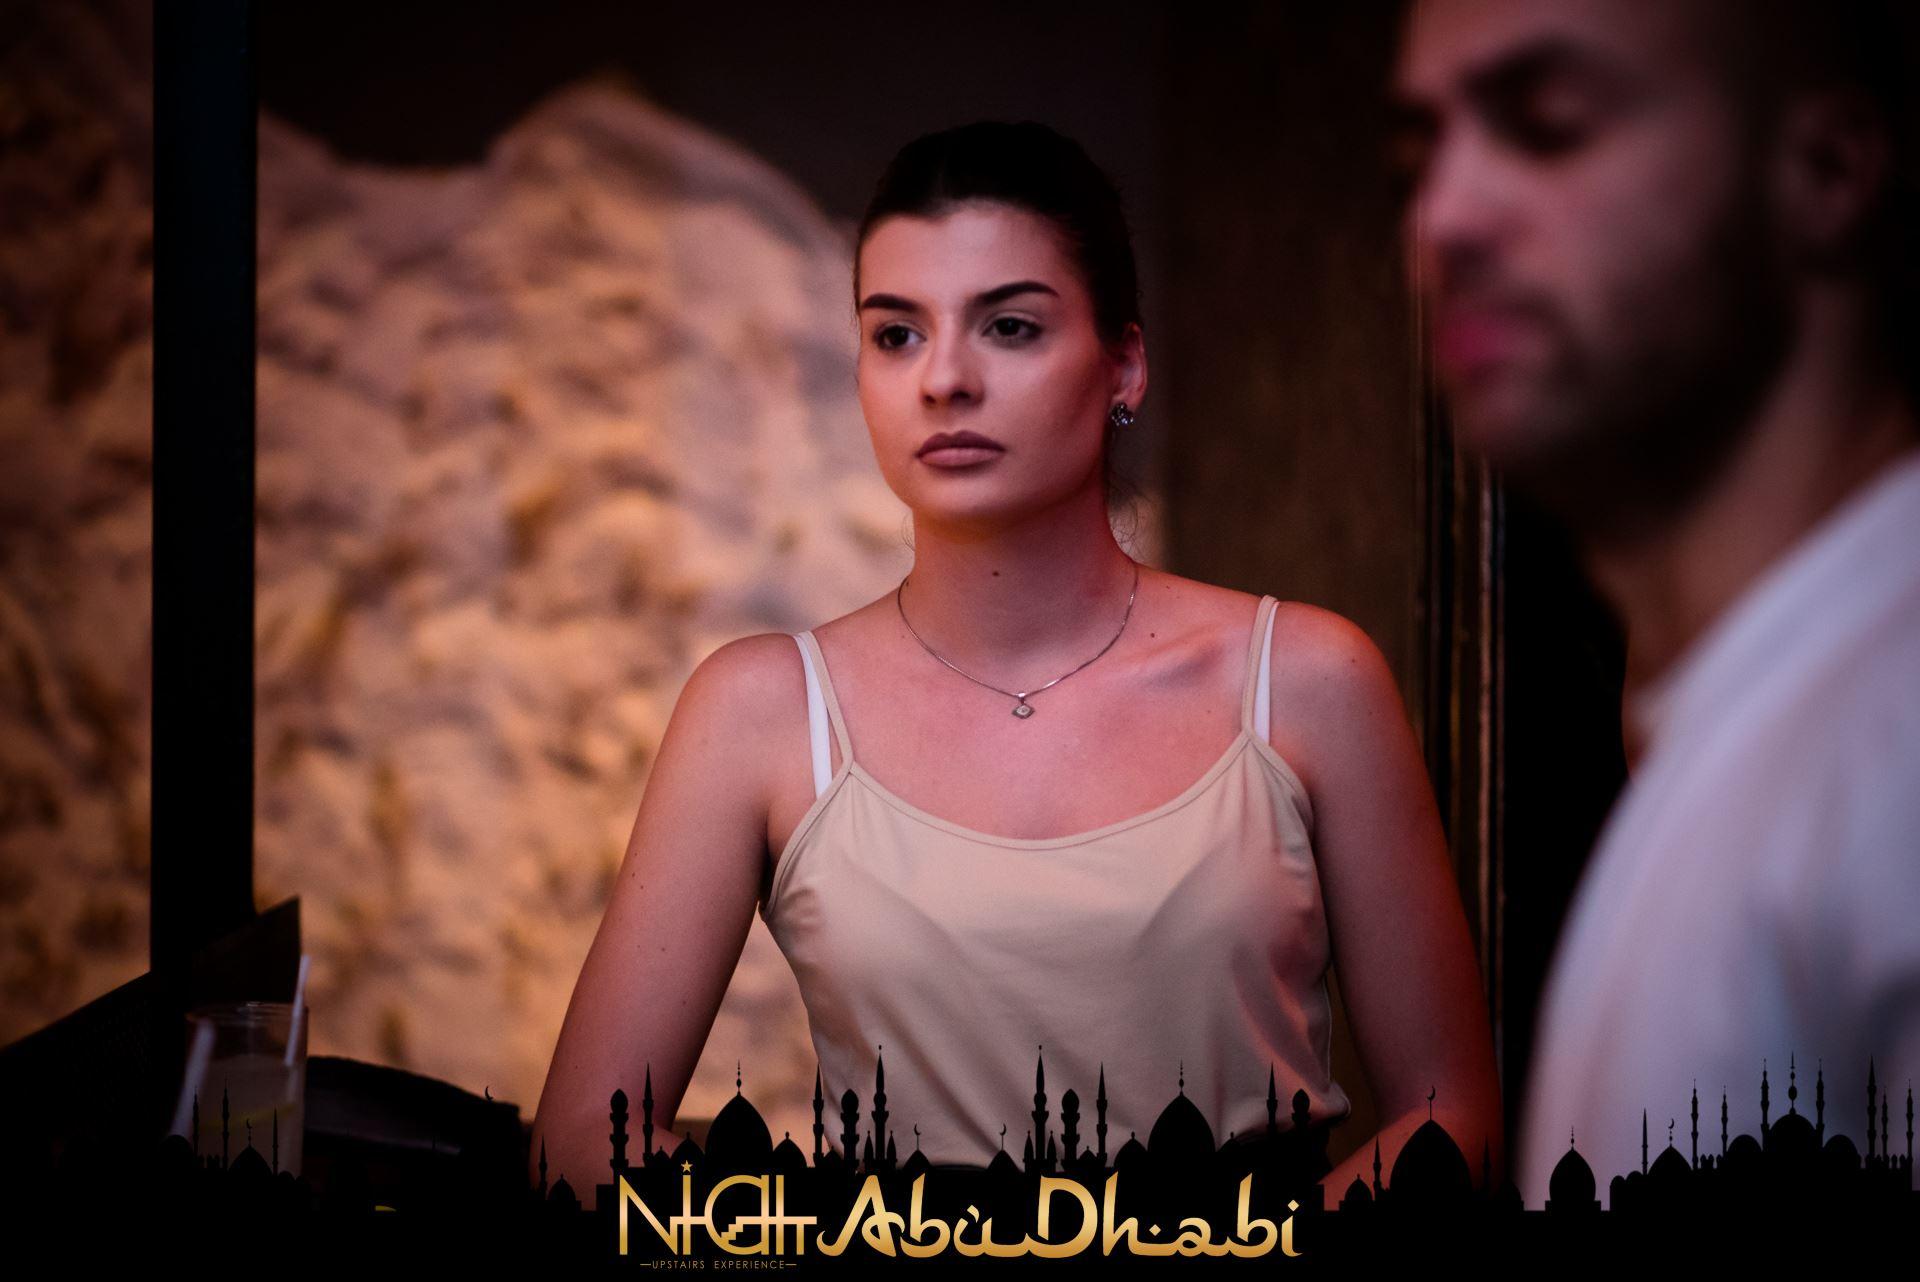 n4 - Ότι καλύτερο είδαμε στο Night! (Παρασκευή 20 Οκτωβρίου)